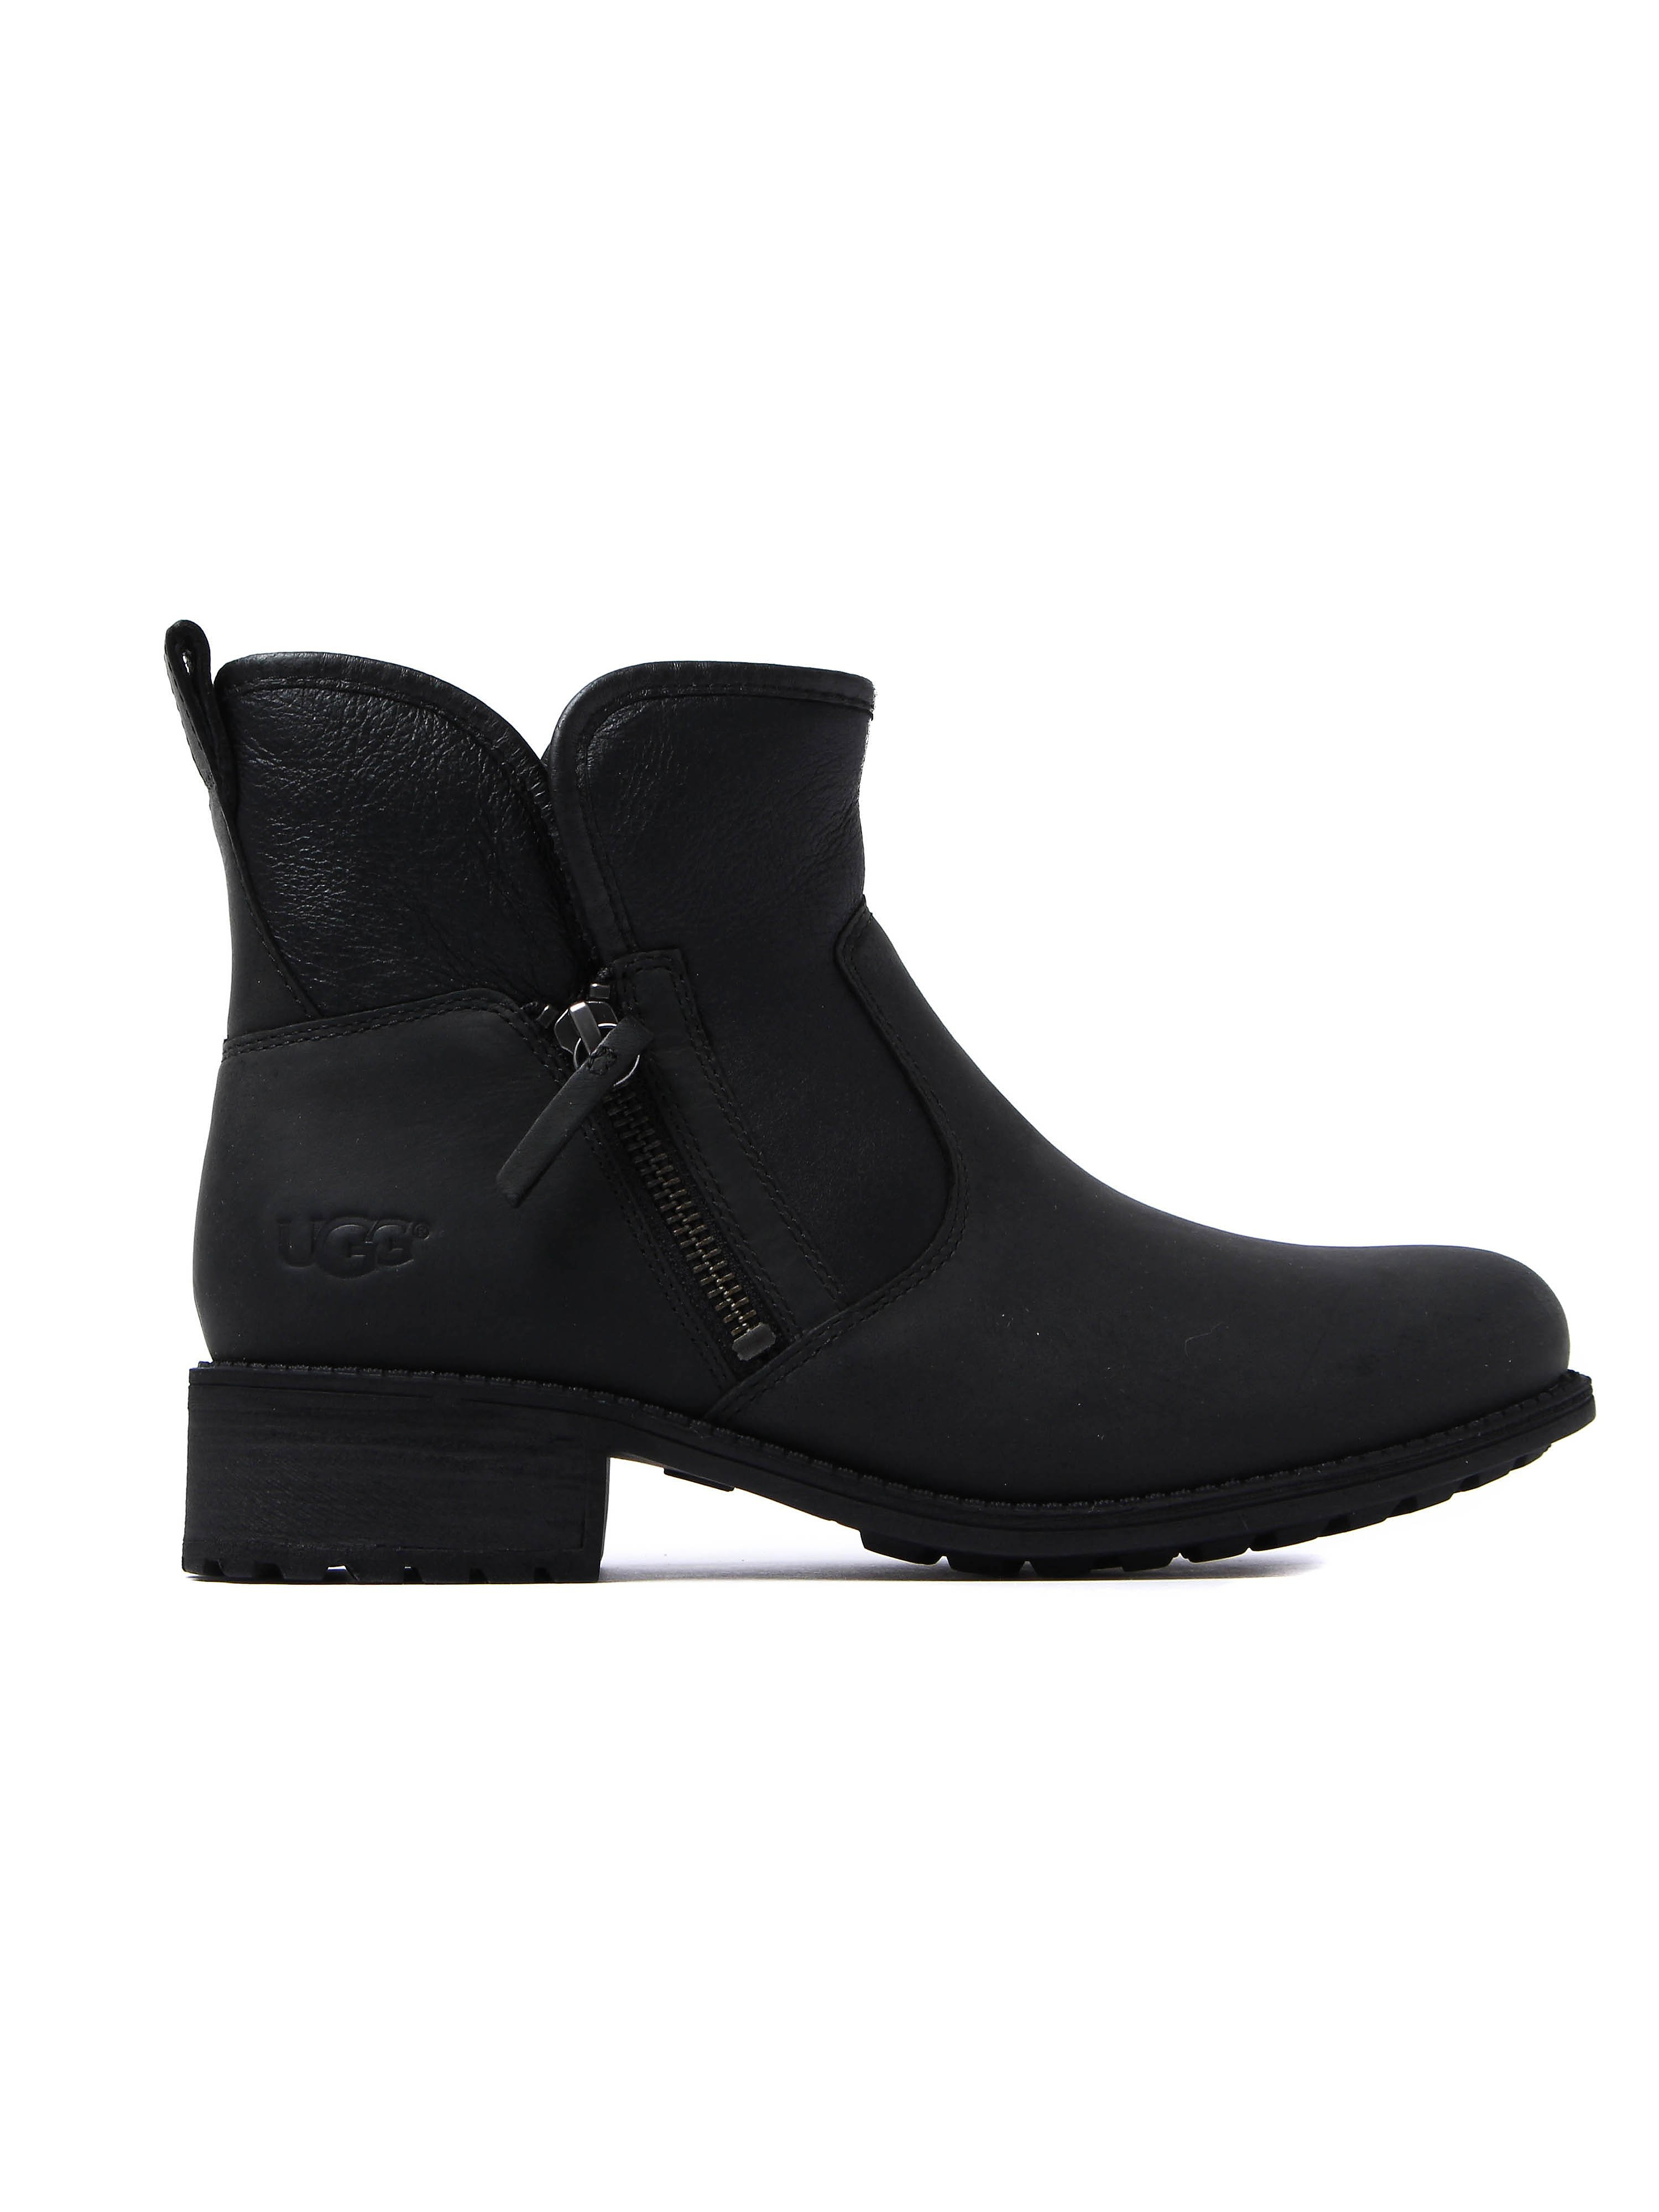 UGG Women's LaVelle Boots - Black